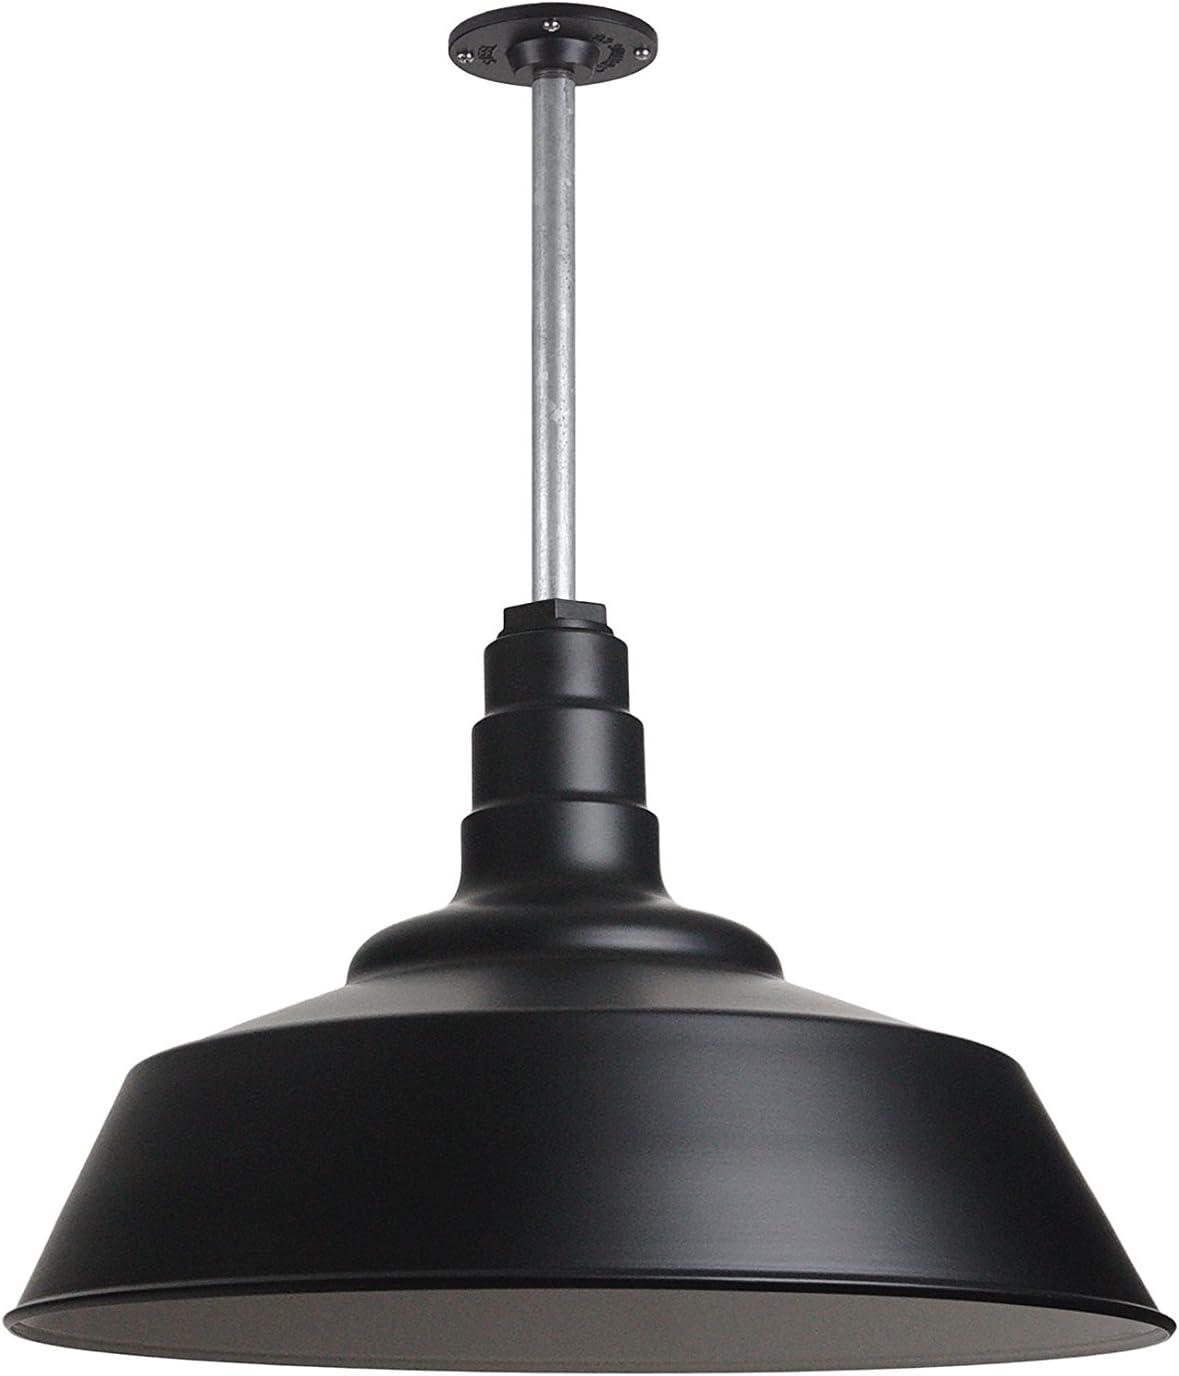 Black Large Warehouse Barn Light with Rigid Stem for Ceiling Made in America Heavy Duty Steel Light The Manhattan Industrial Pendant Light